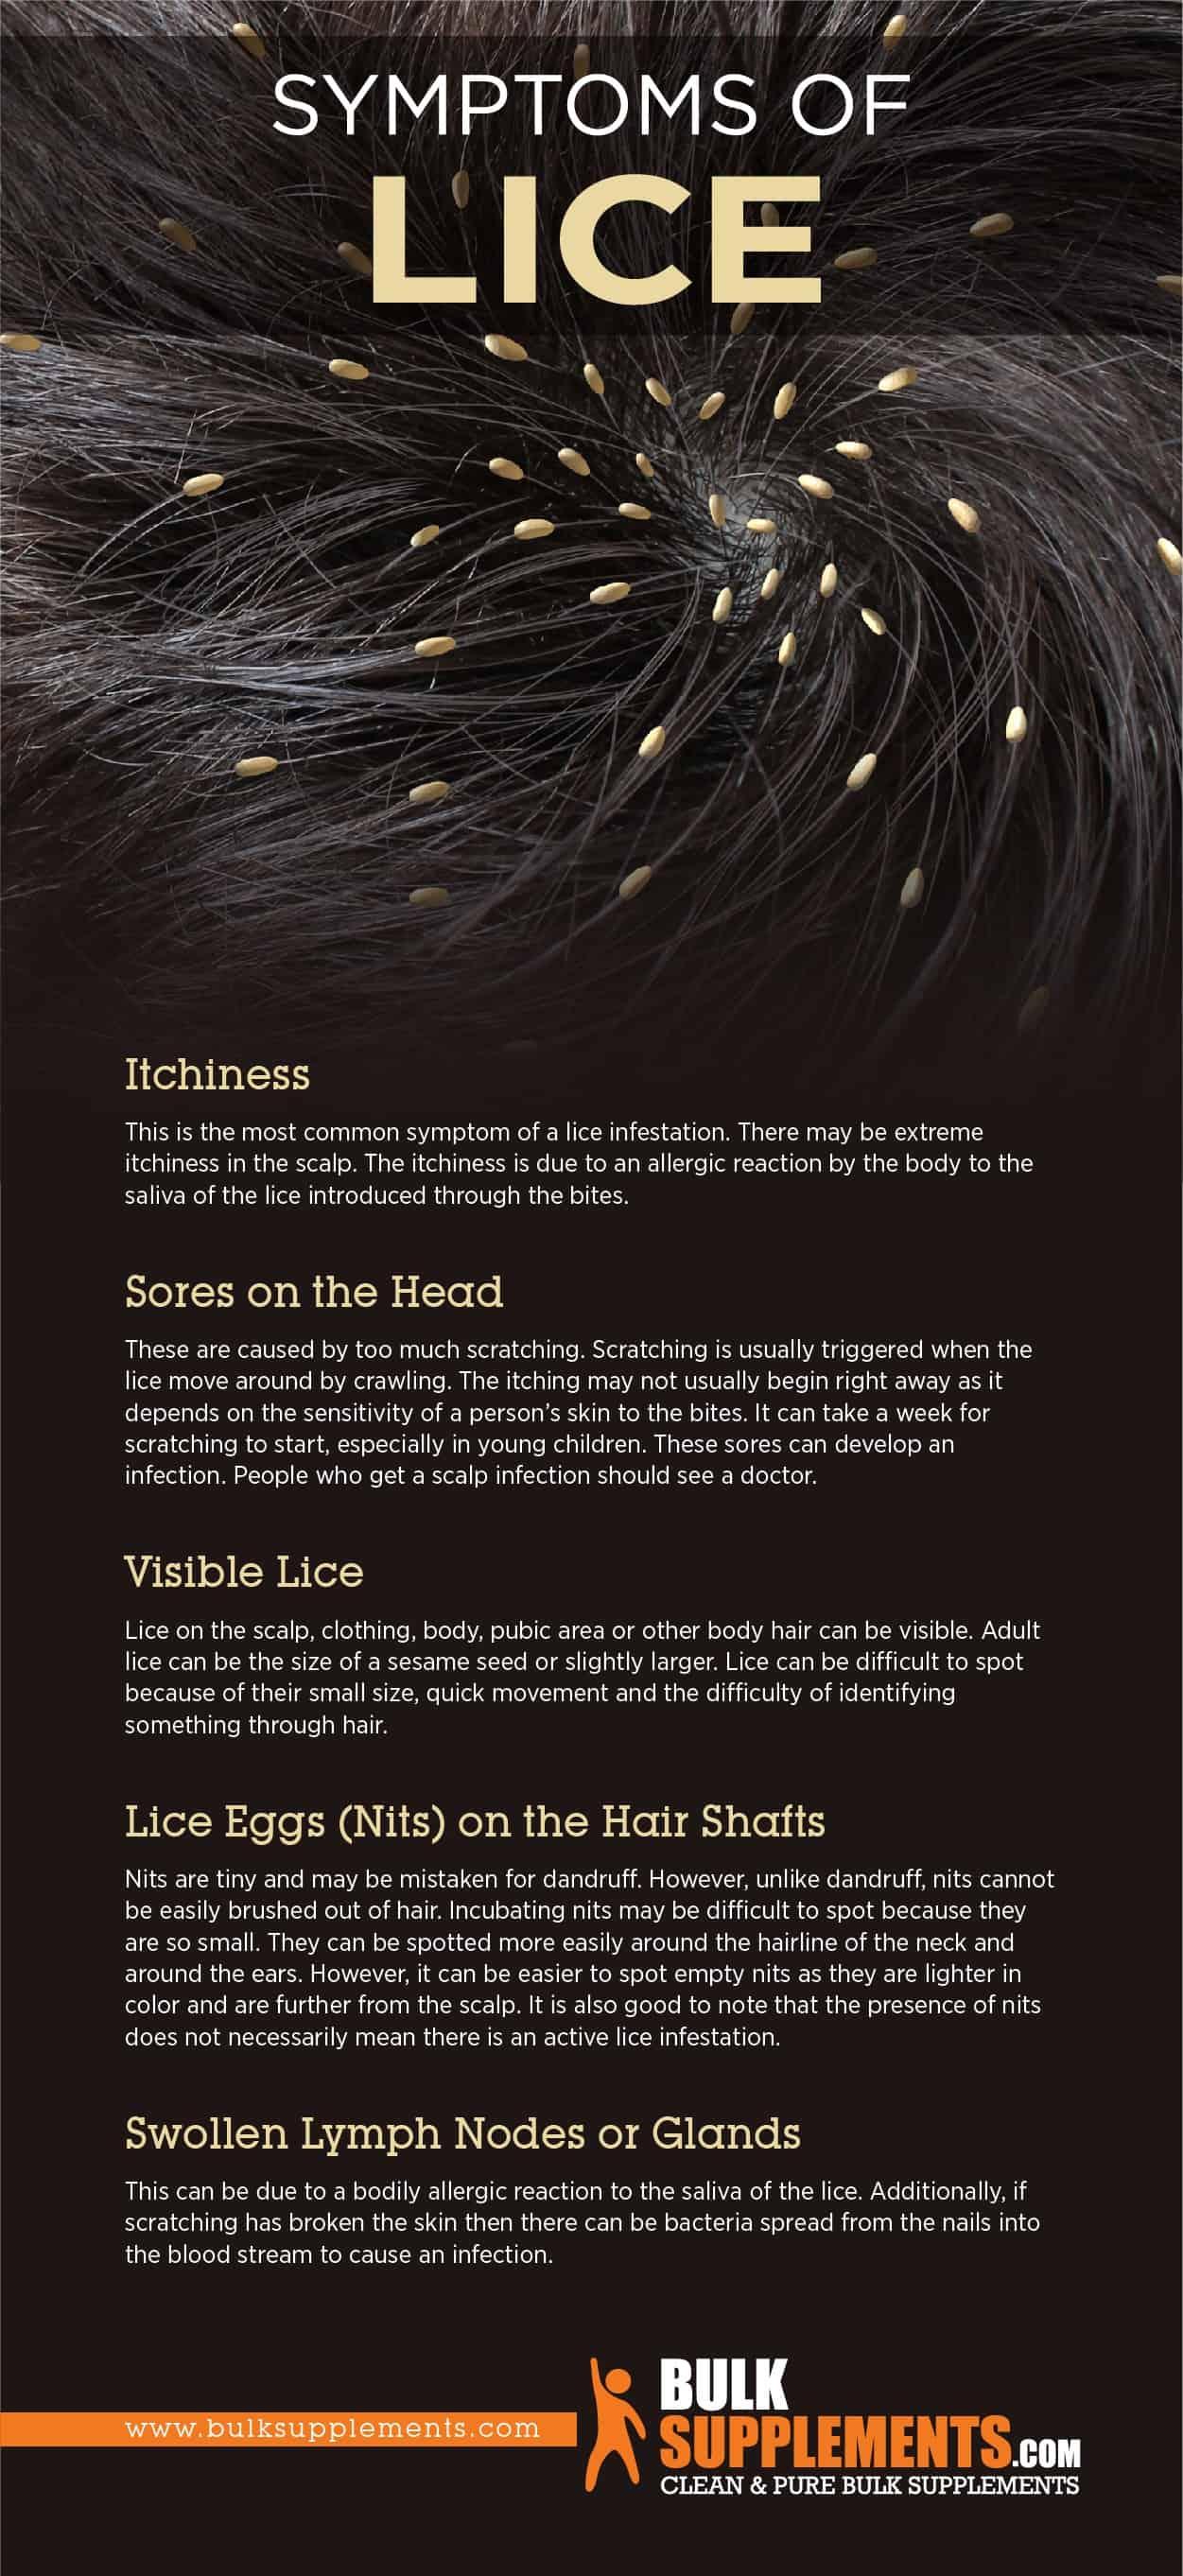 Symptoms of Lice